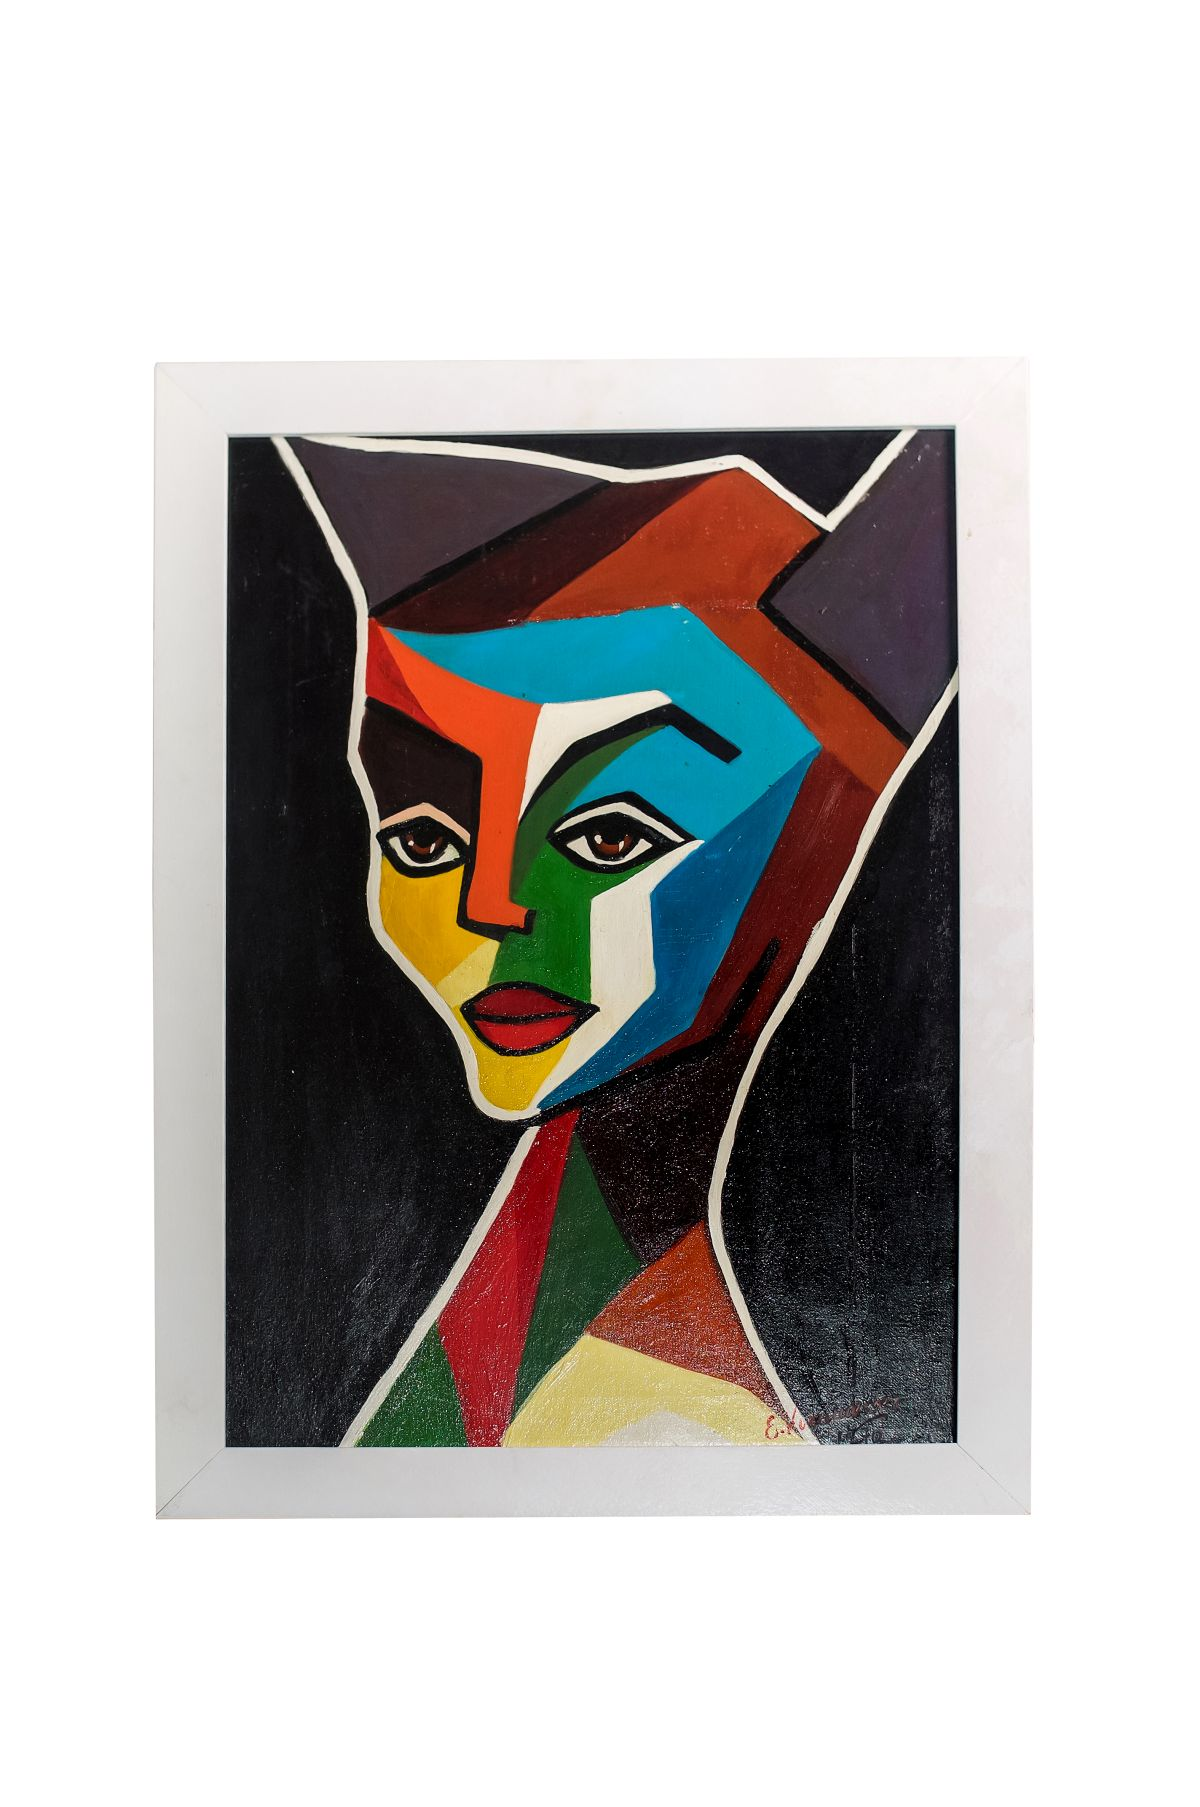 "#149 Erika Kornmesser ""Self Portrait ""1971 | Erika Kornmesser (1934) ""Selbstporträt"" 1971 Image"